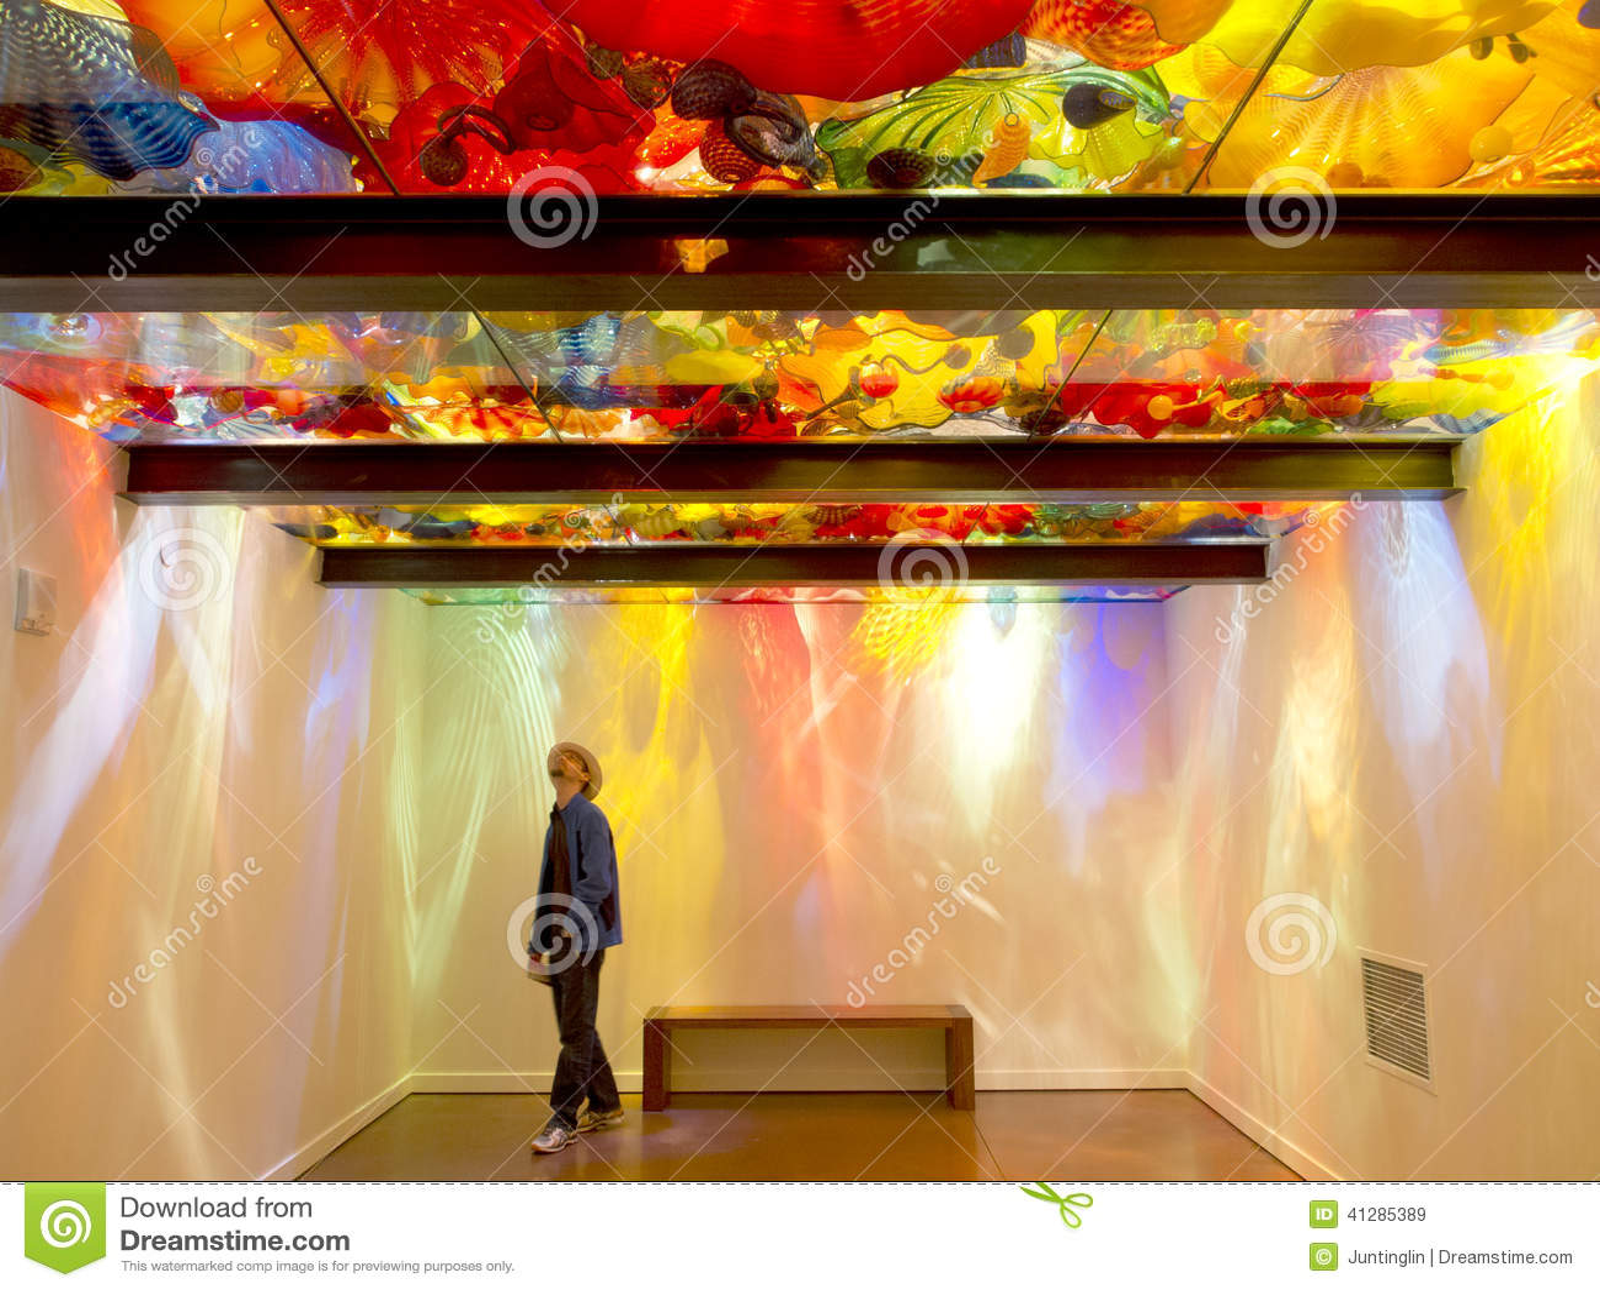 Jardin de Chihuli et musée en verre à Seattle - plafond persan